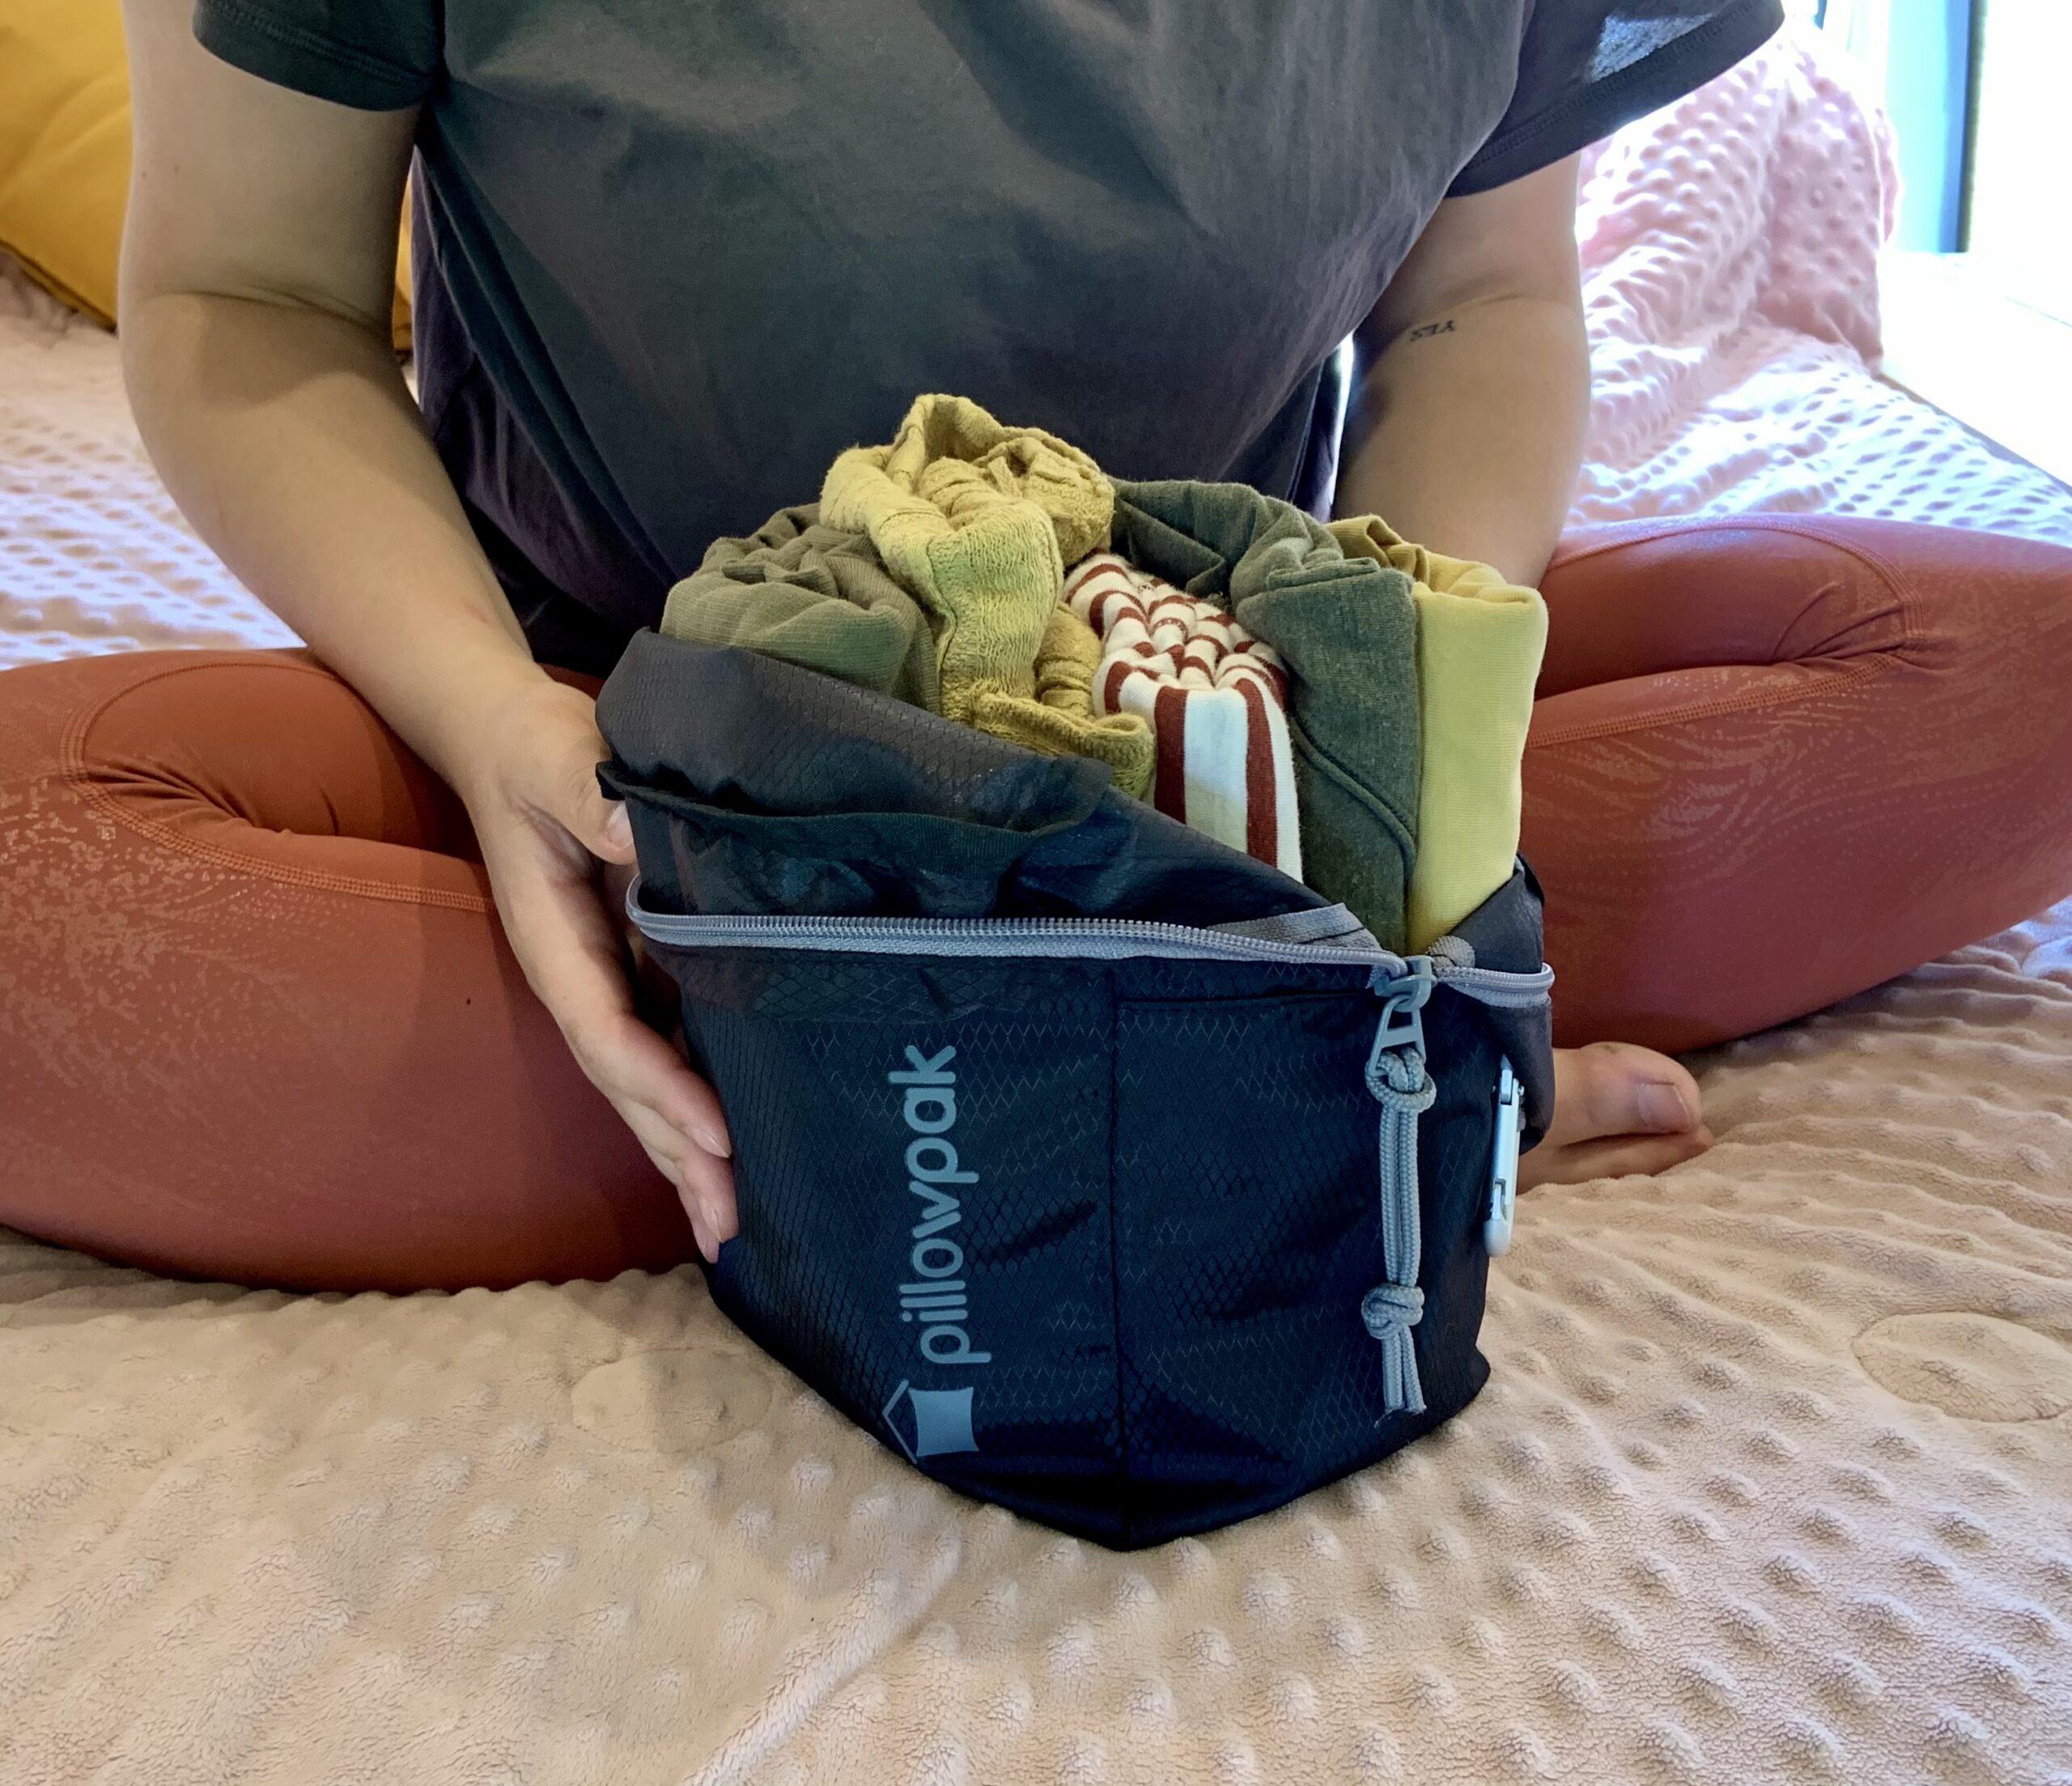 Pillowpak Vanlife Storage Packing Cube